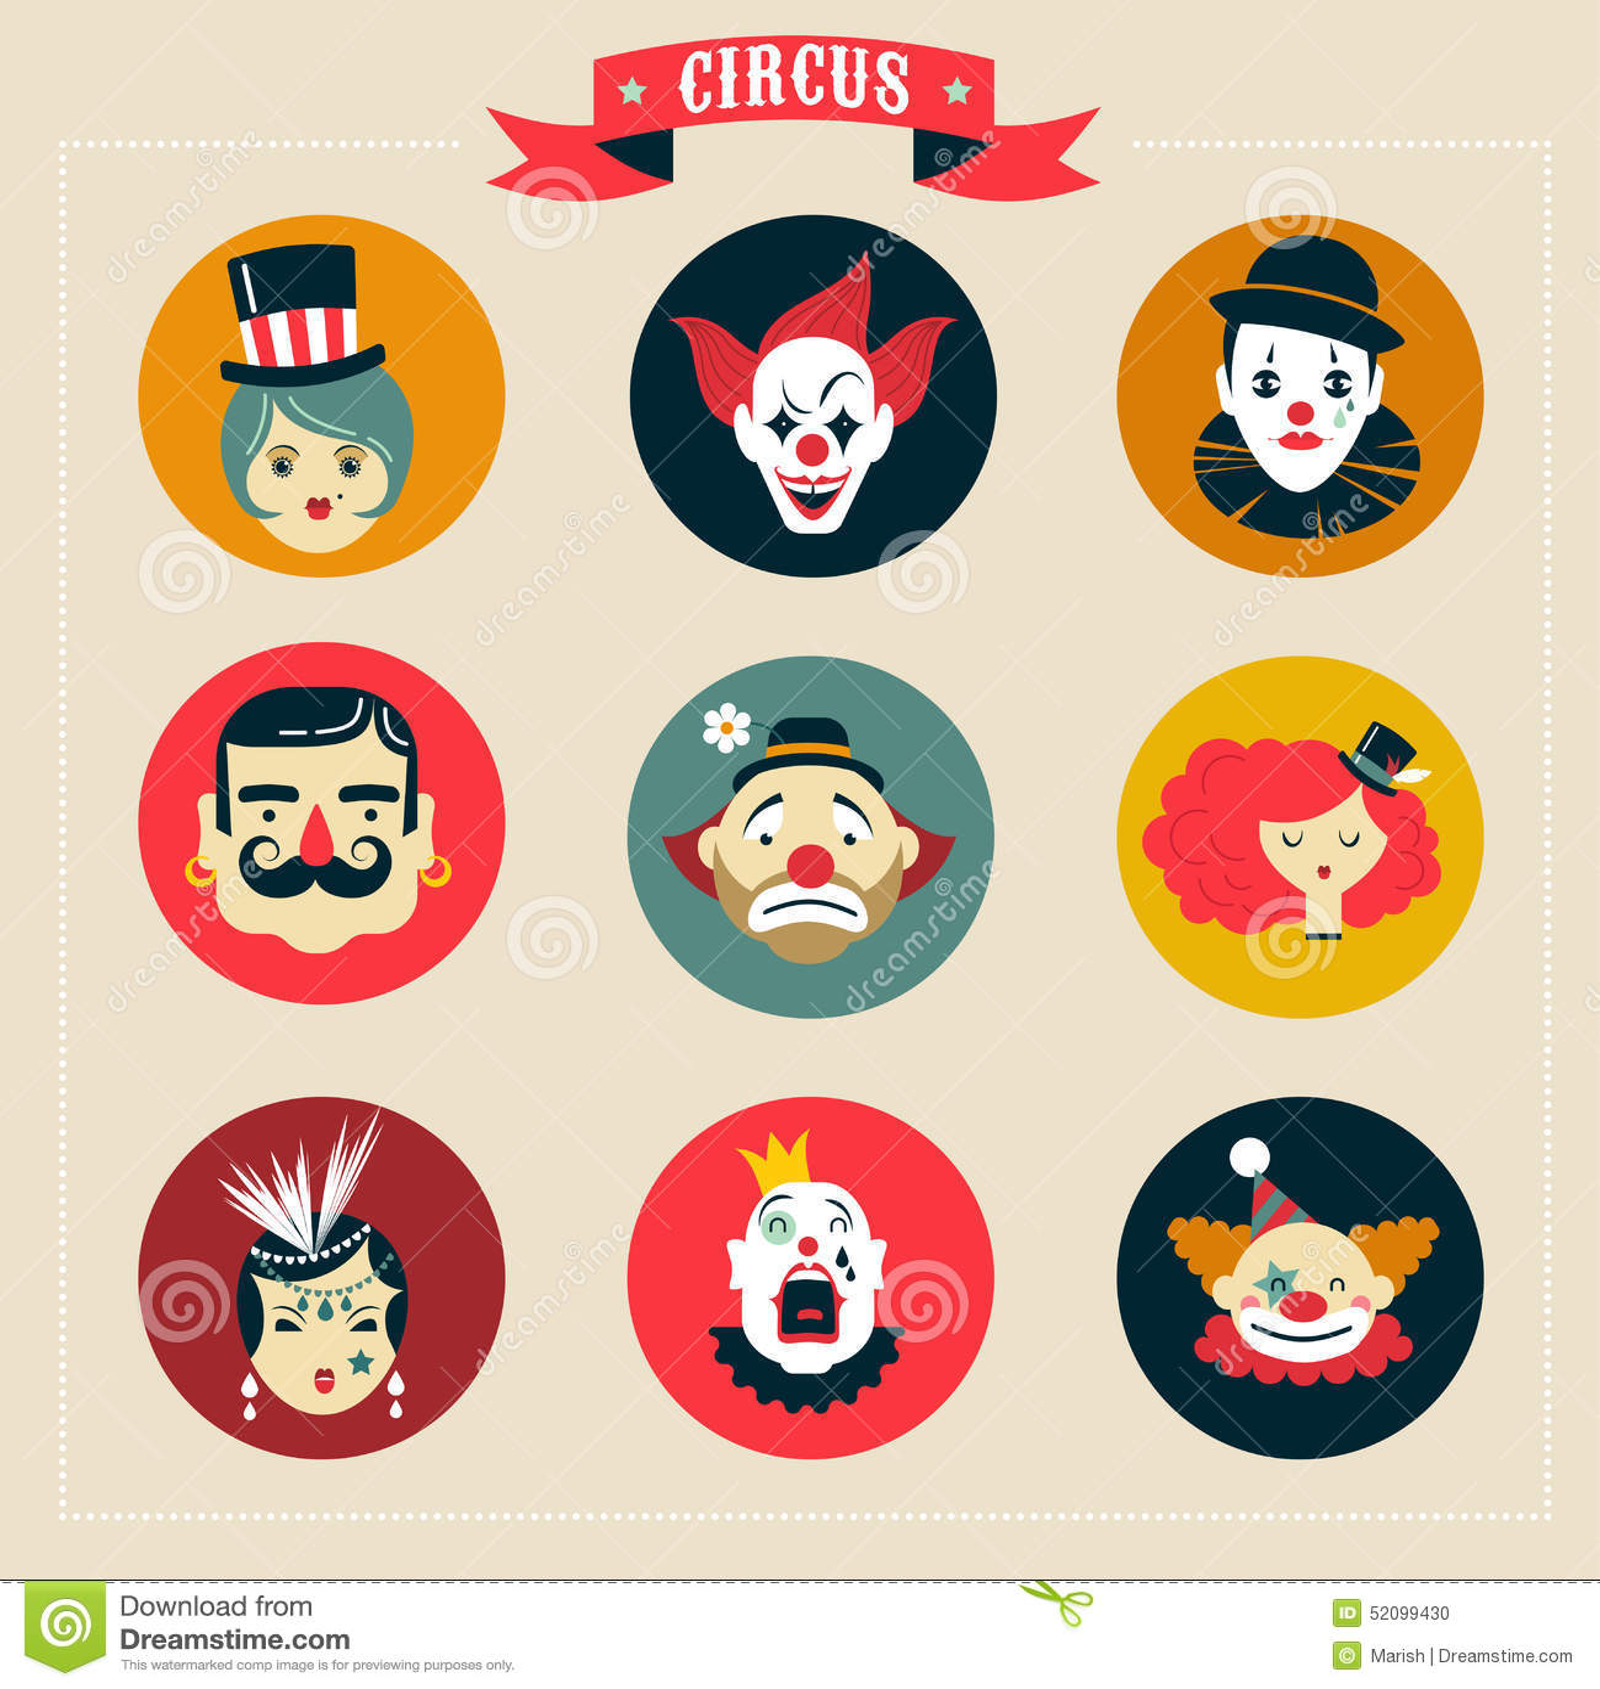 Pinhead circus freak